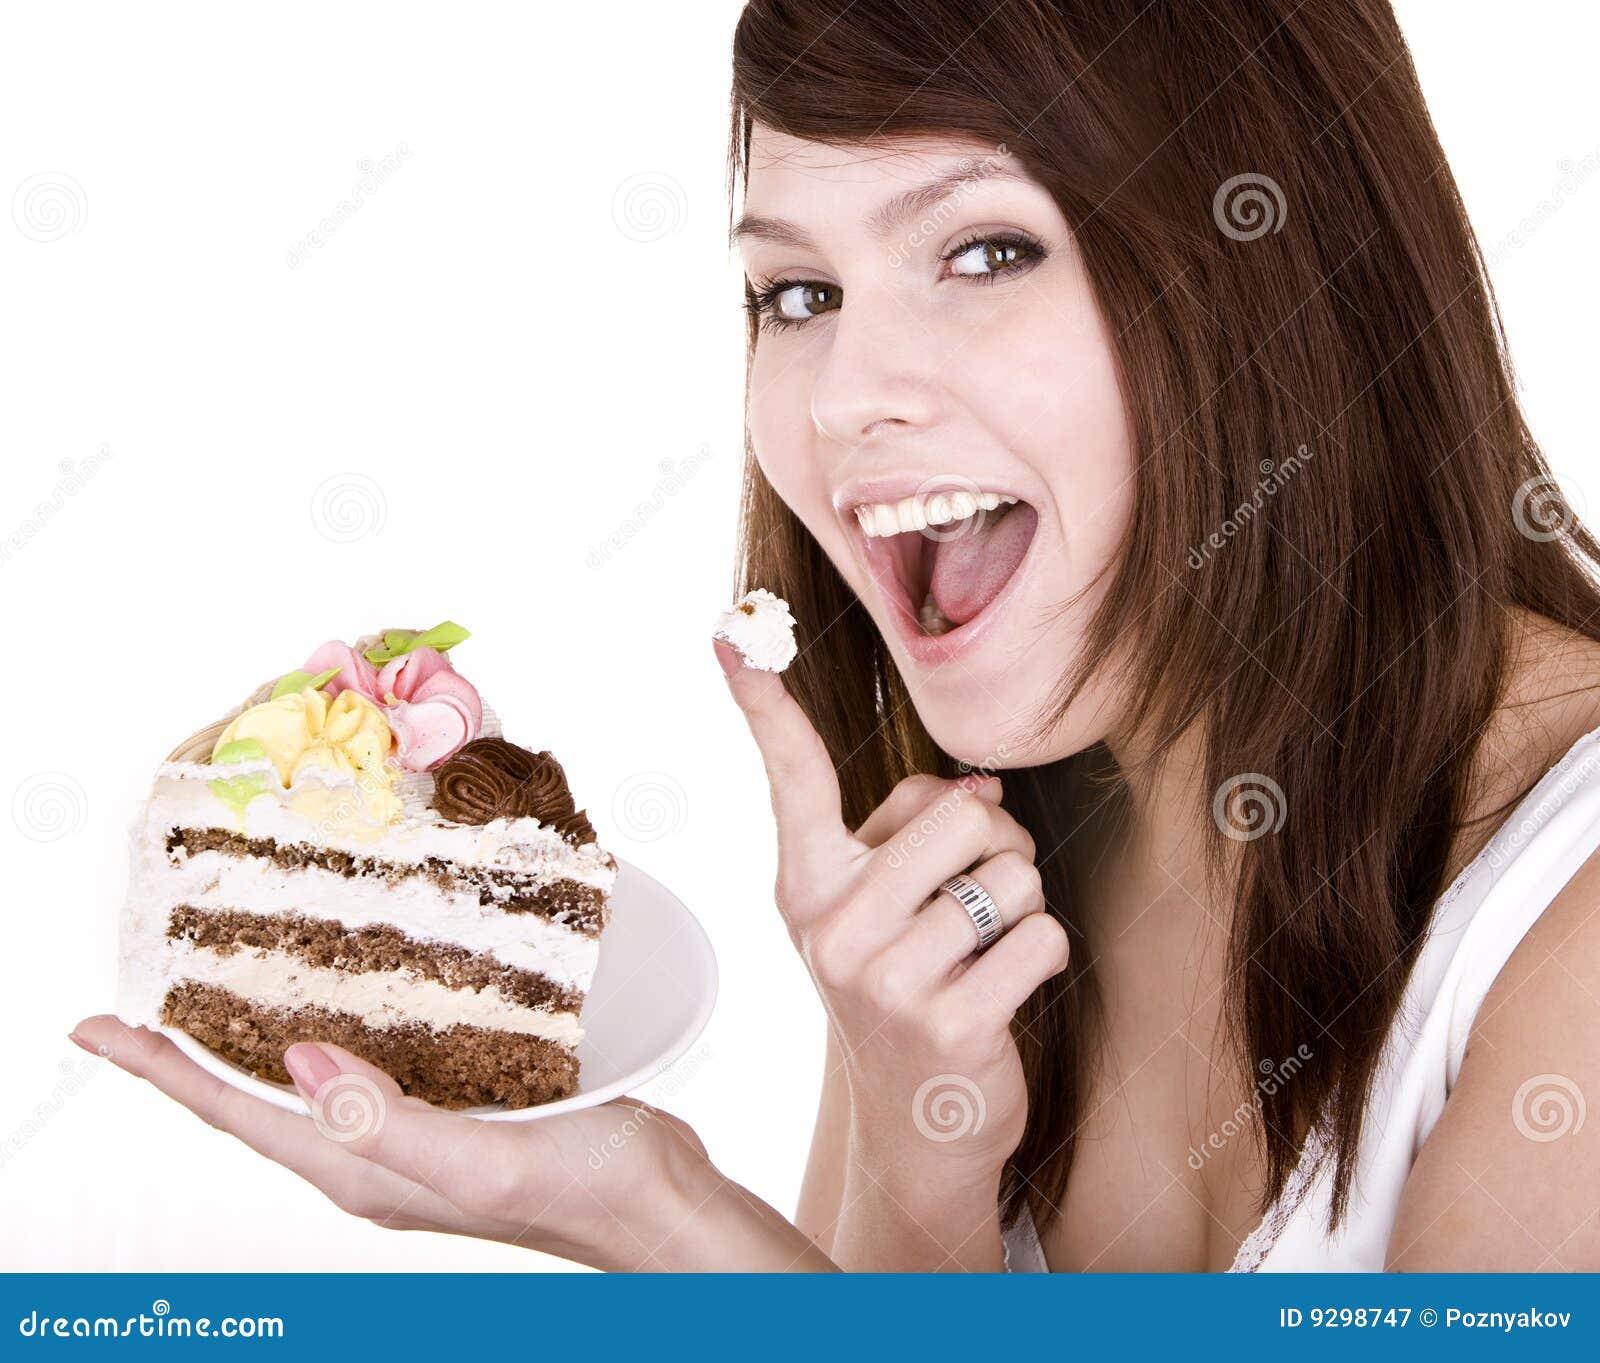 Girl eating piece of cake.